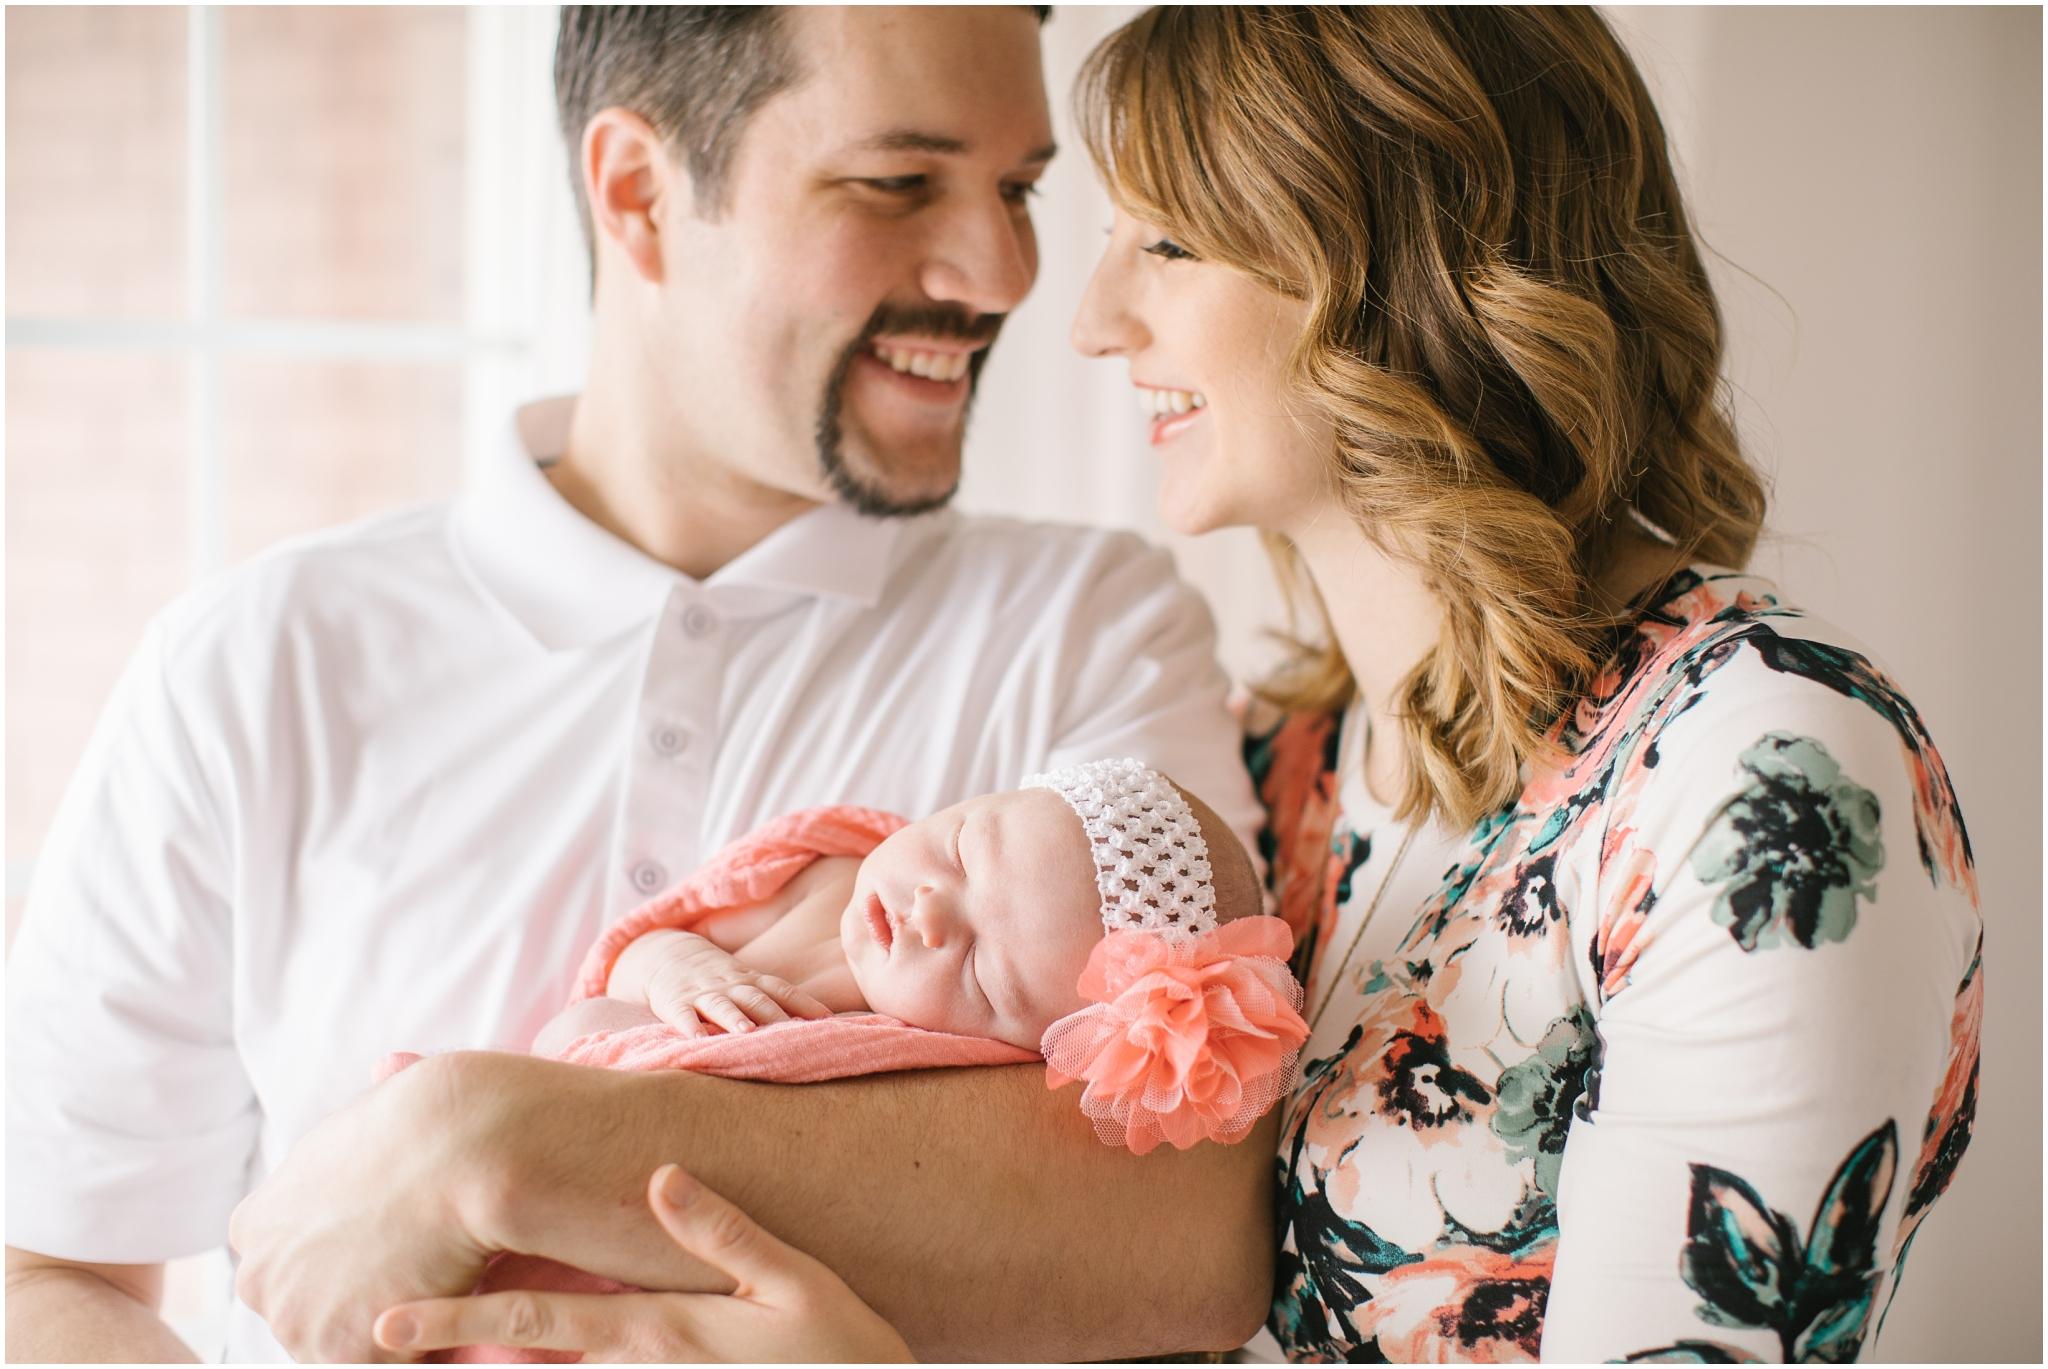 Autumn-51_Lizzie-B-Imagery-Utah-Family-Photographer-Central-Utah-Photographer-Utah-County-Newborn.jpg